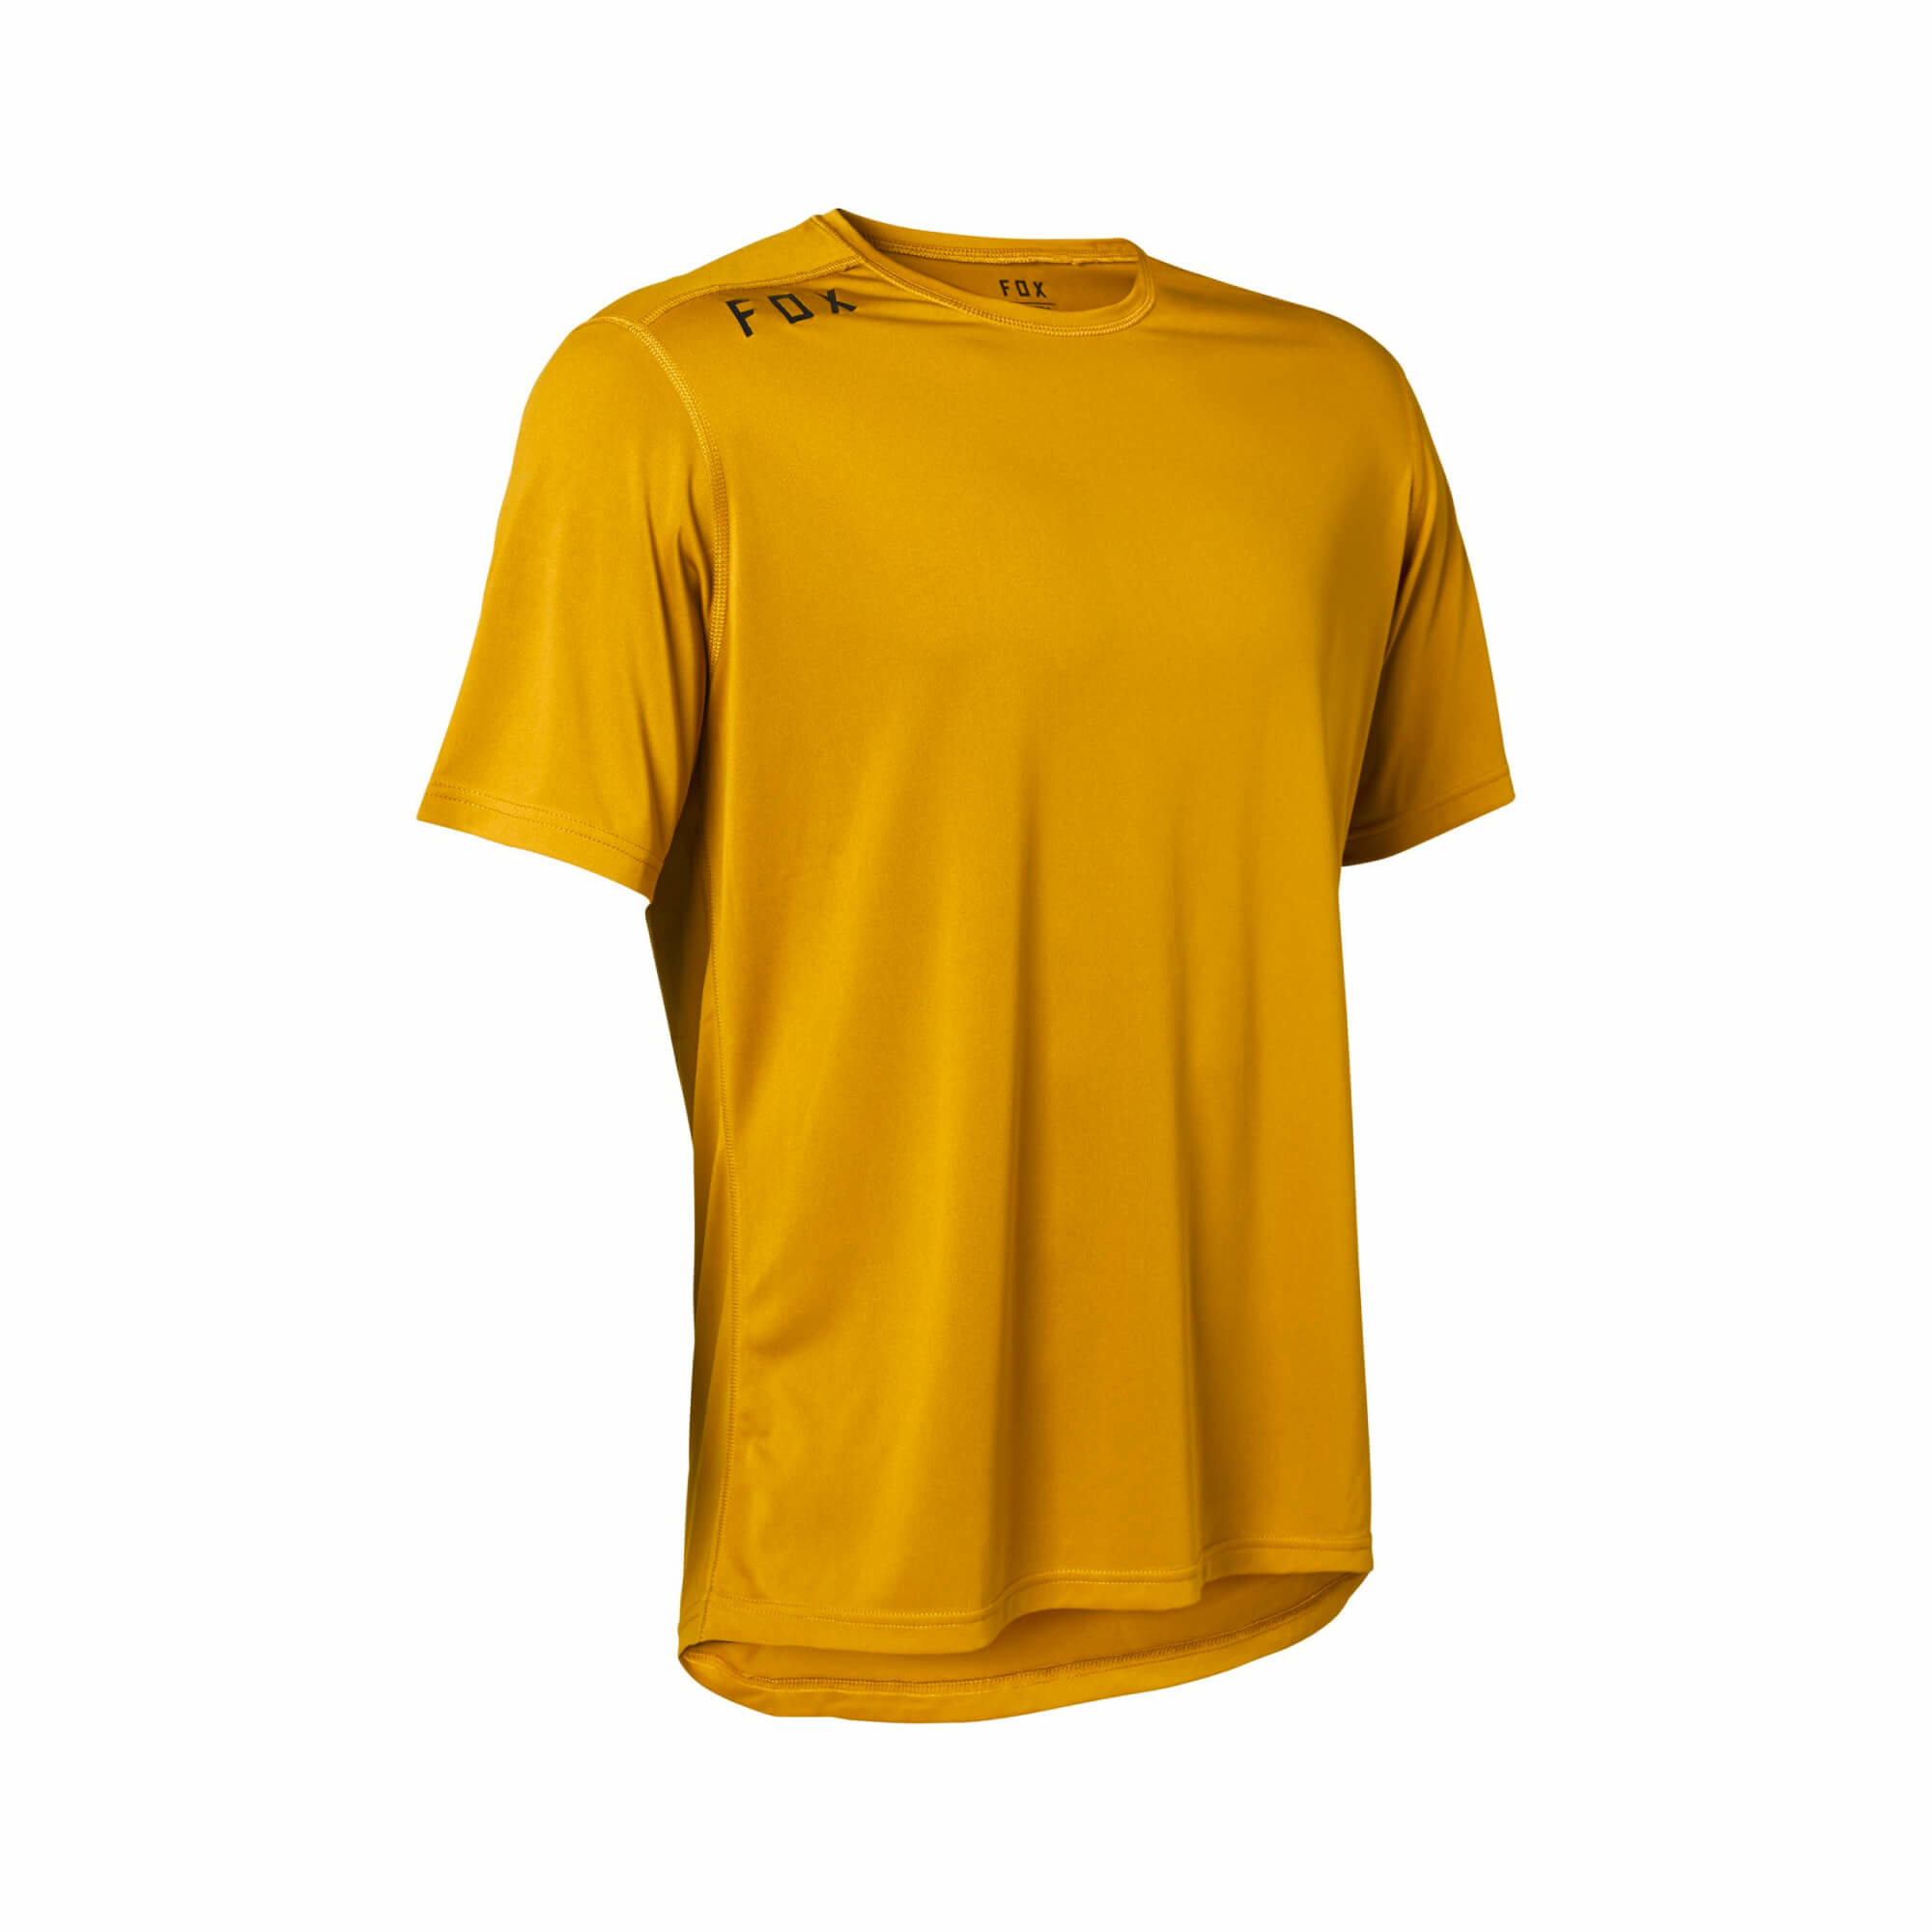 Ranger Short Sleeve Jersey Graphic 2 2021-2